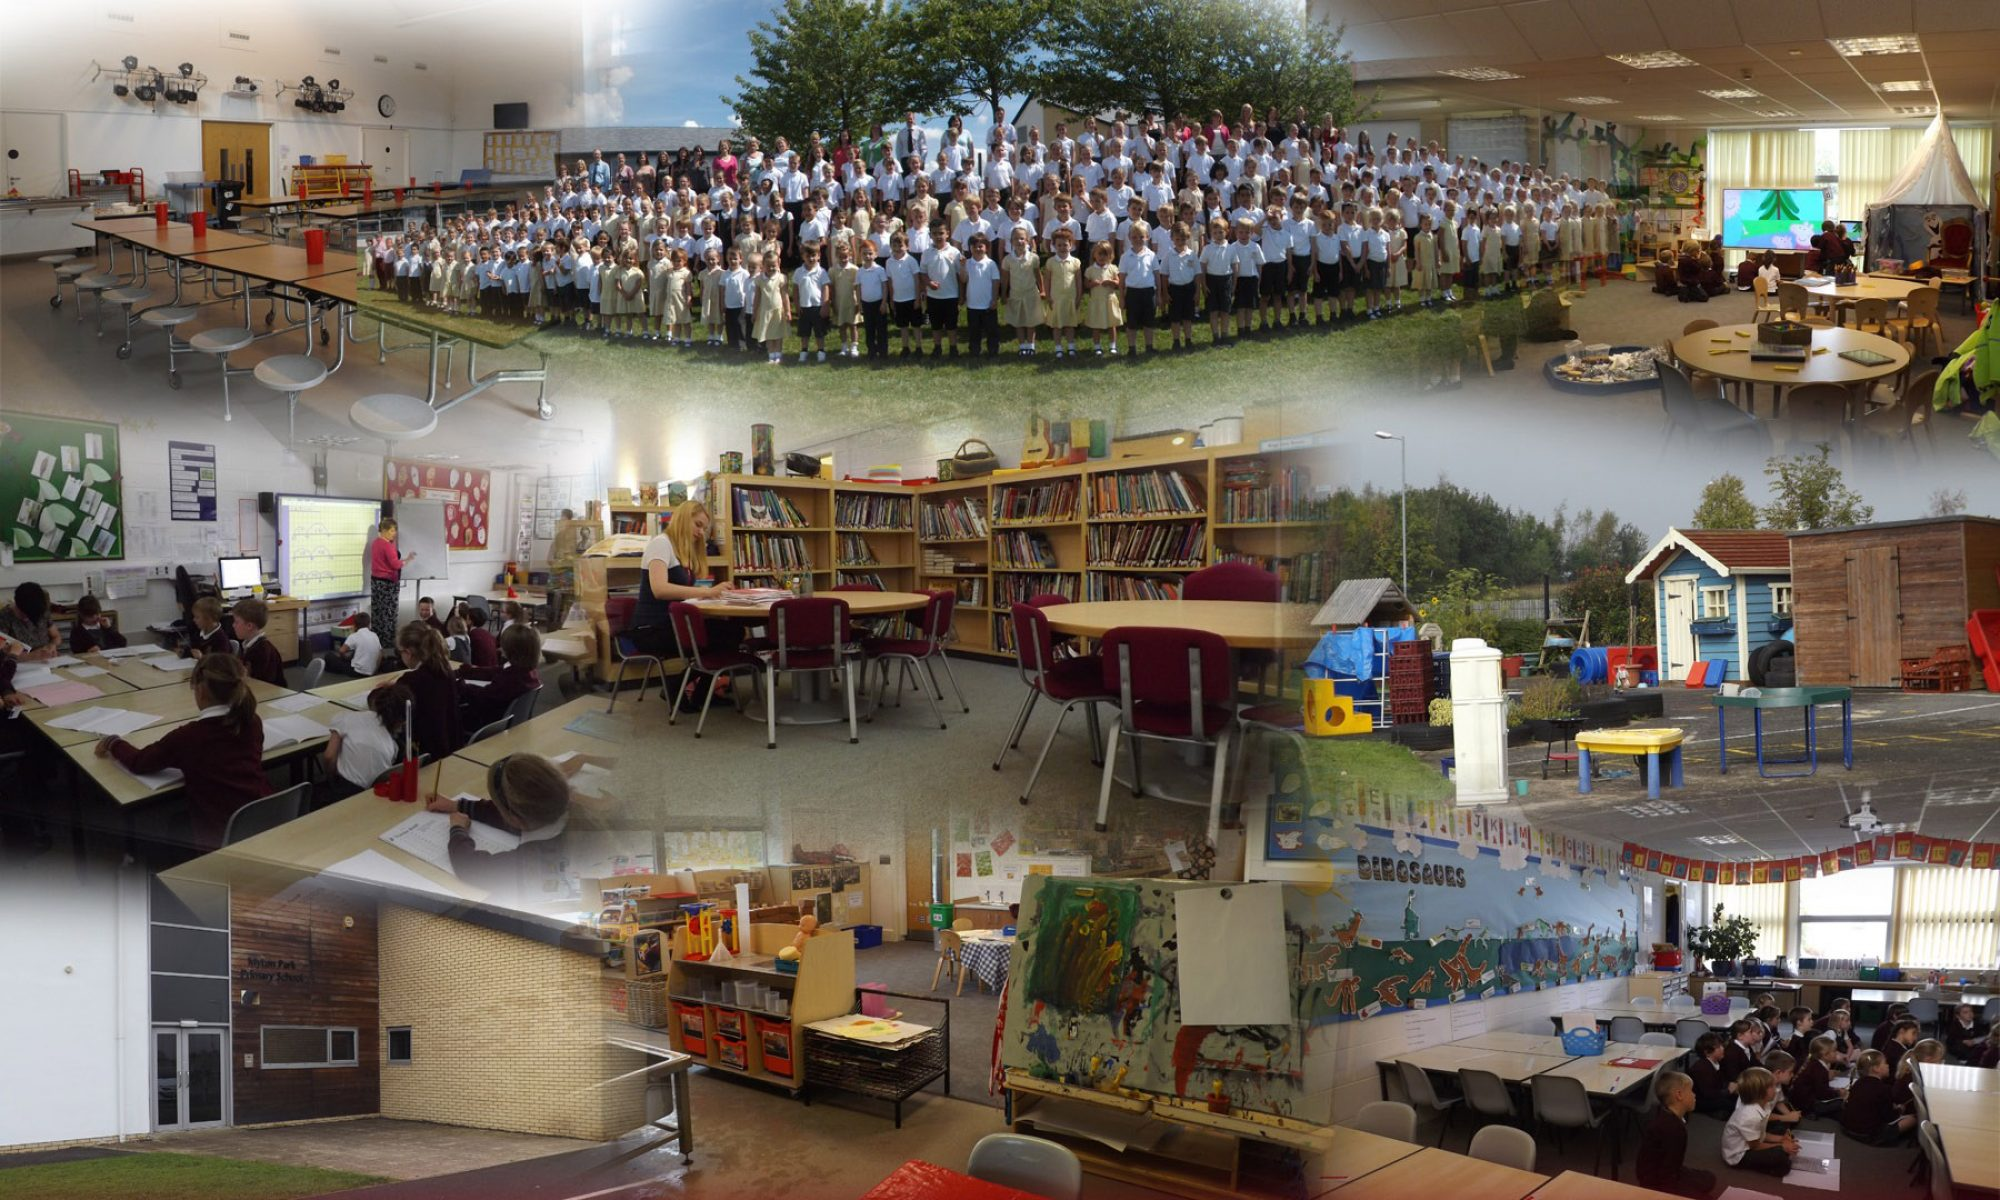 Myton Park Primary School